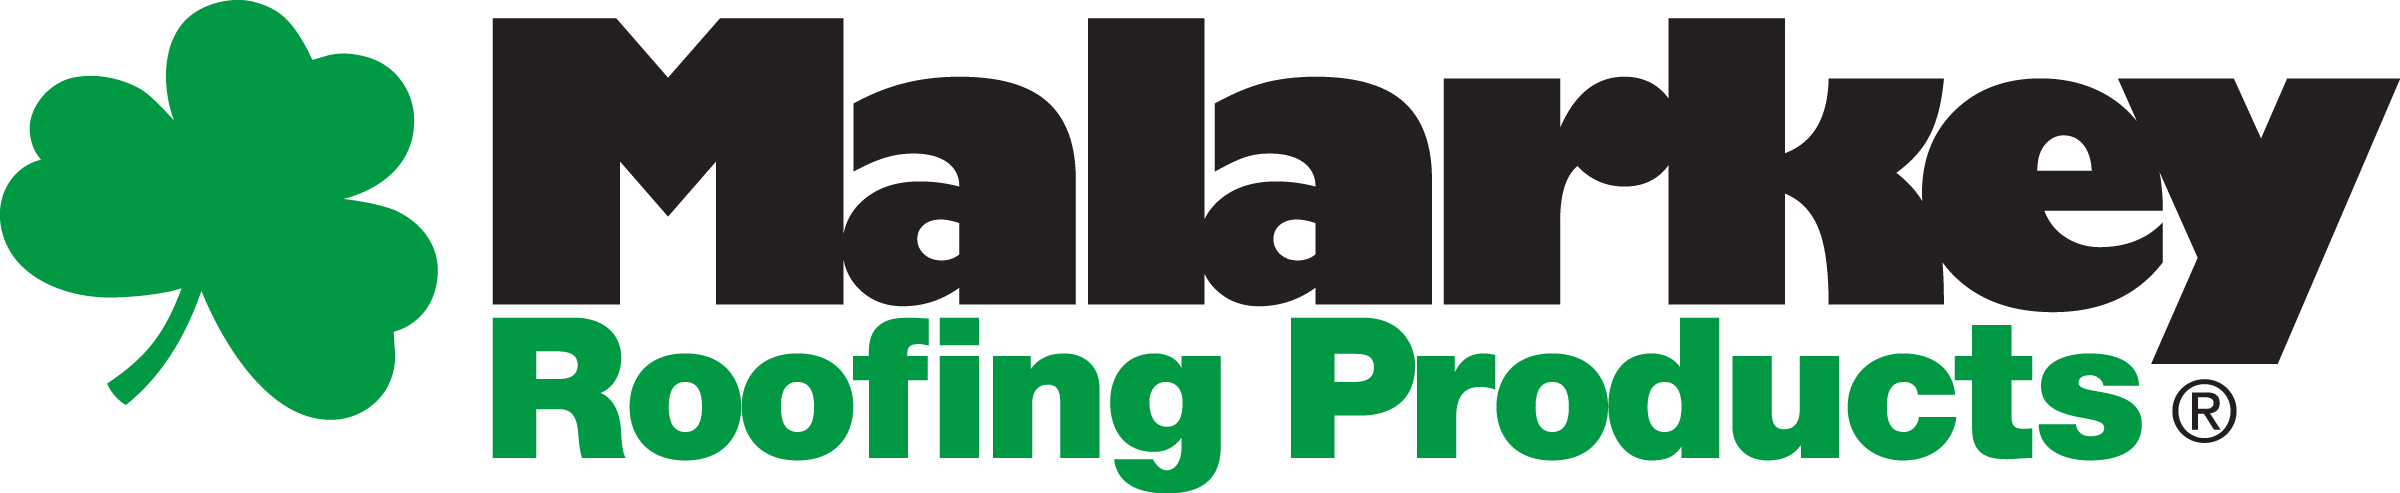 Malarkey_Logo.jpg